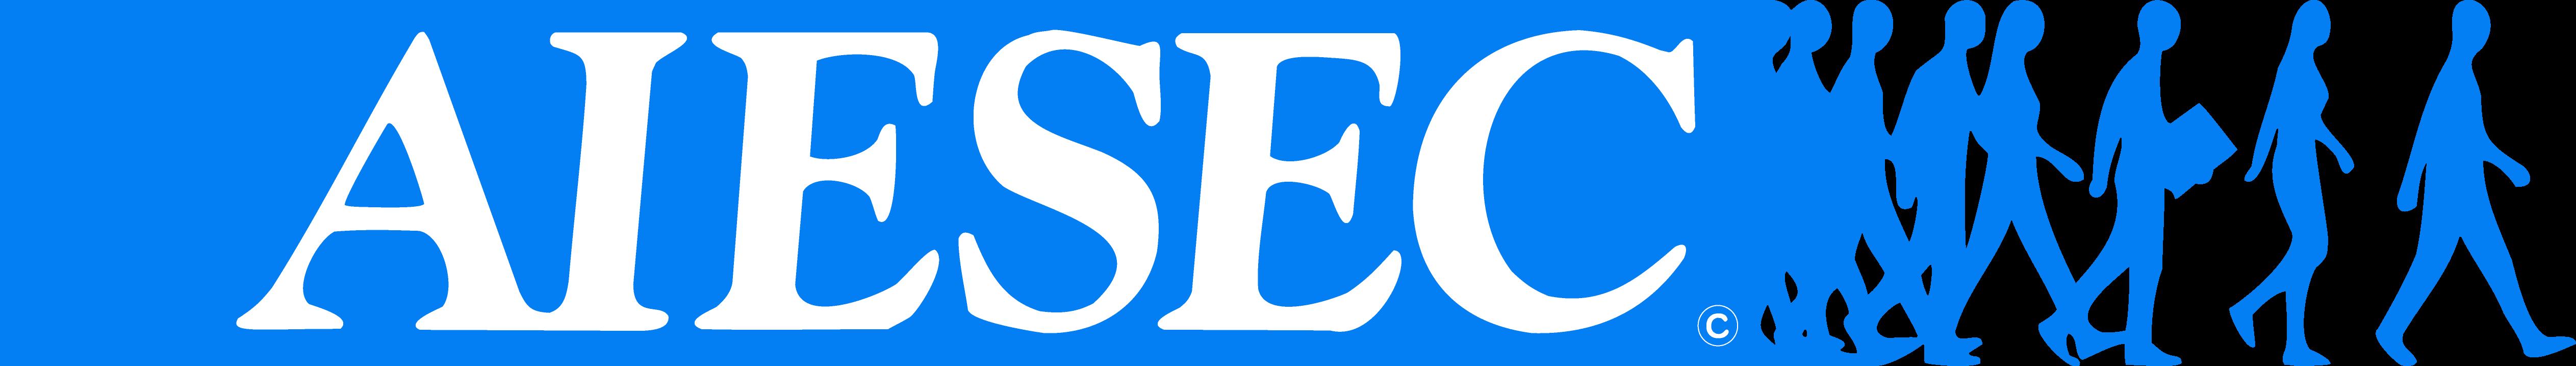 AIESEC